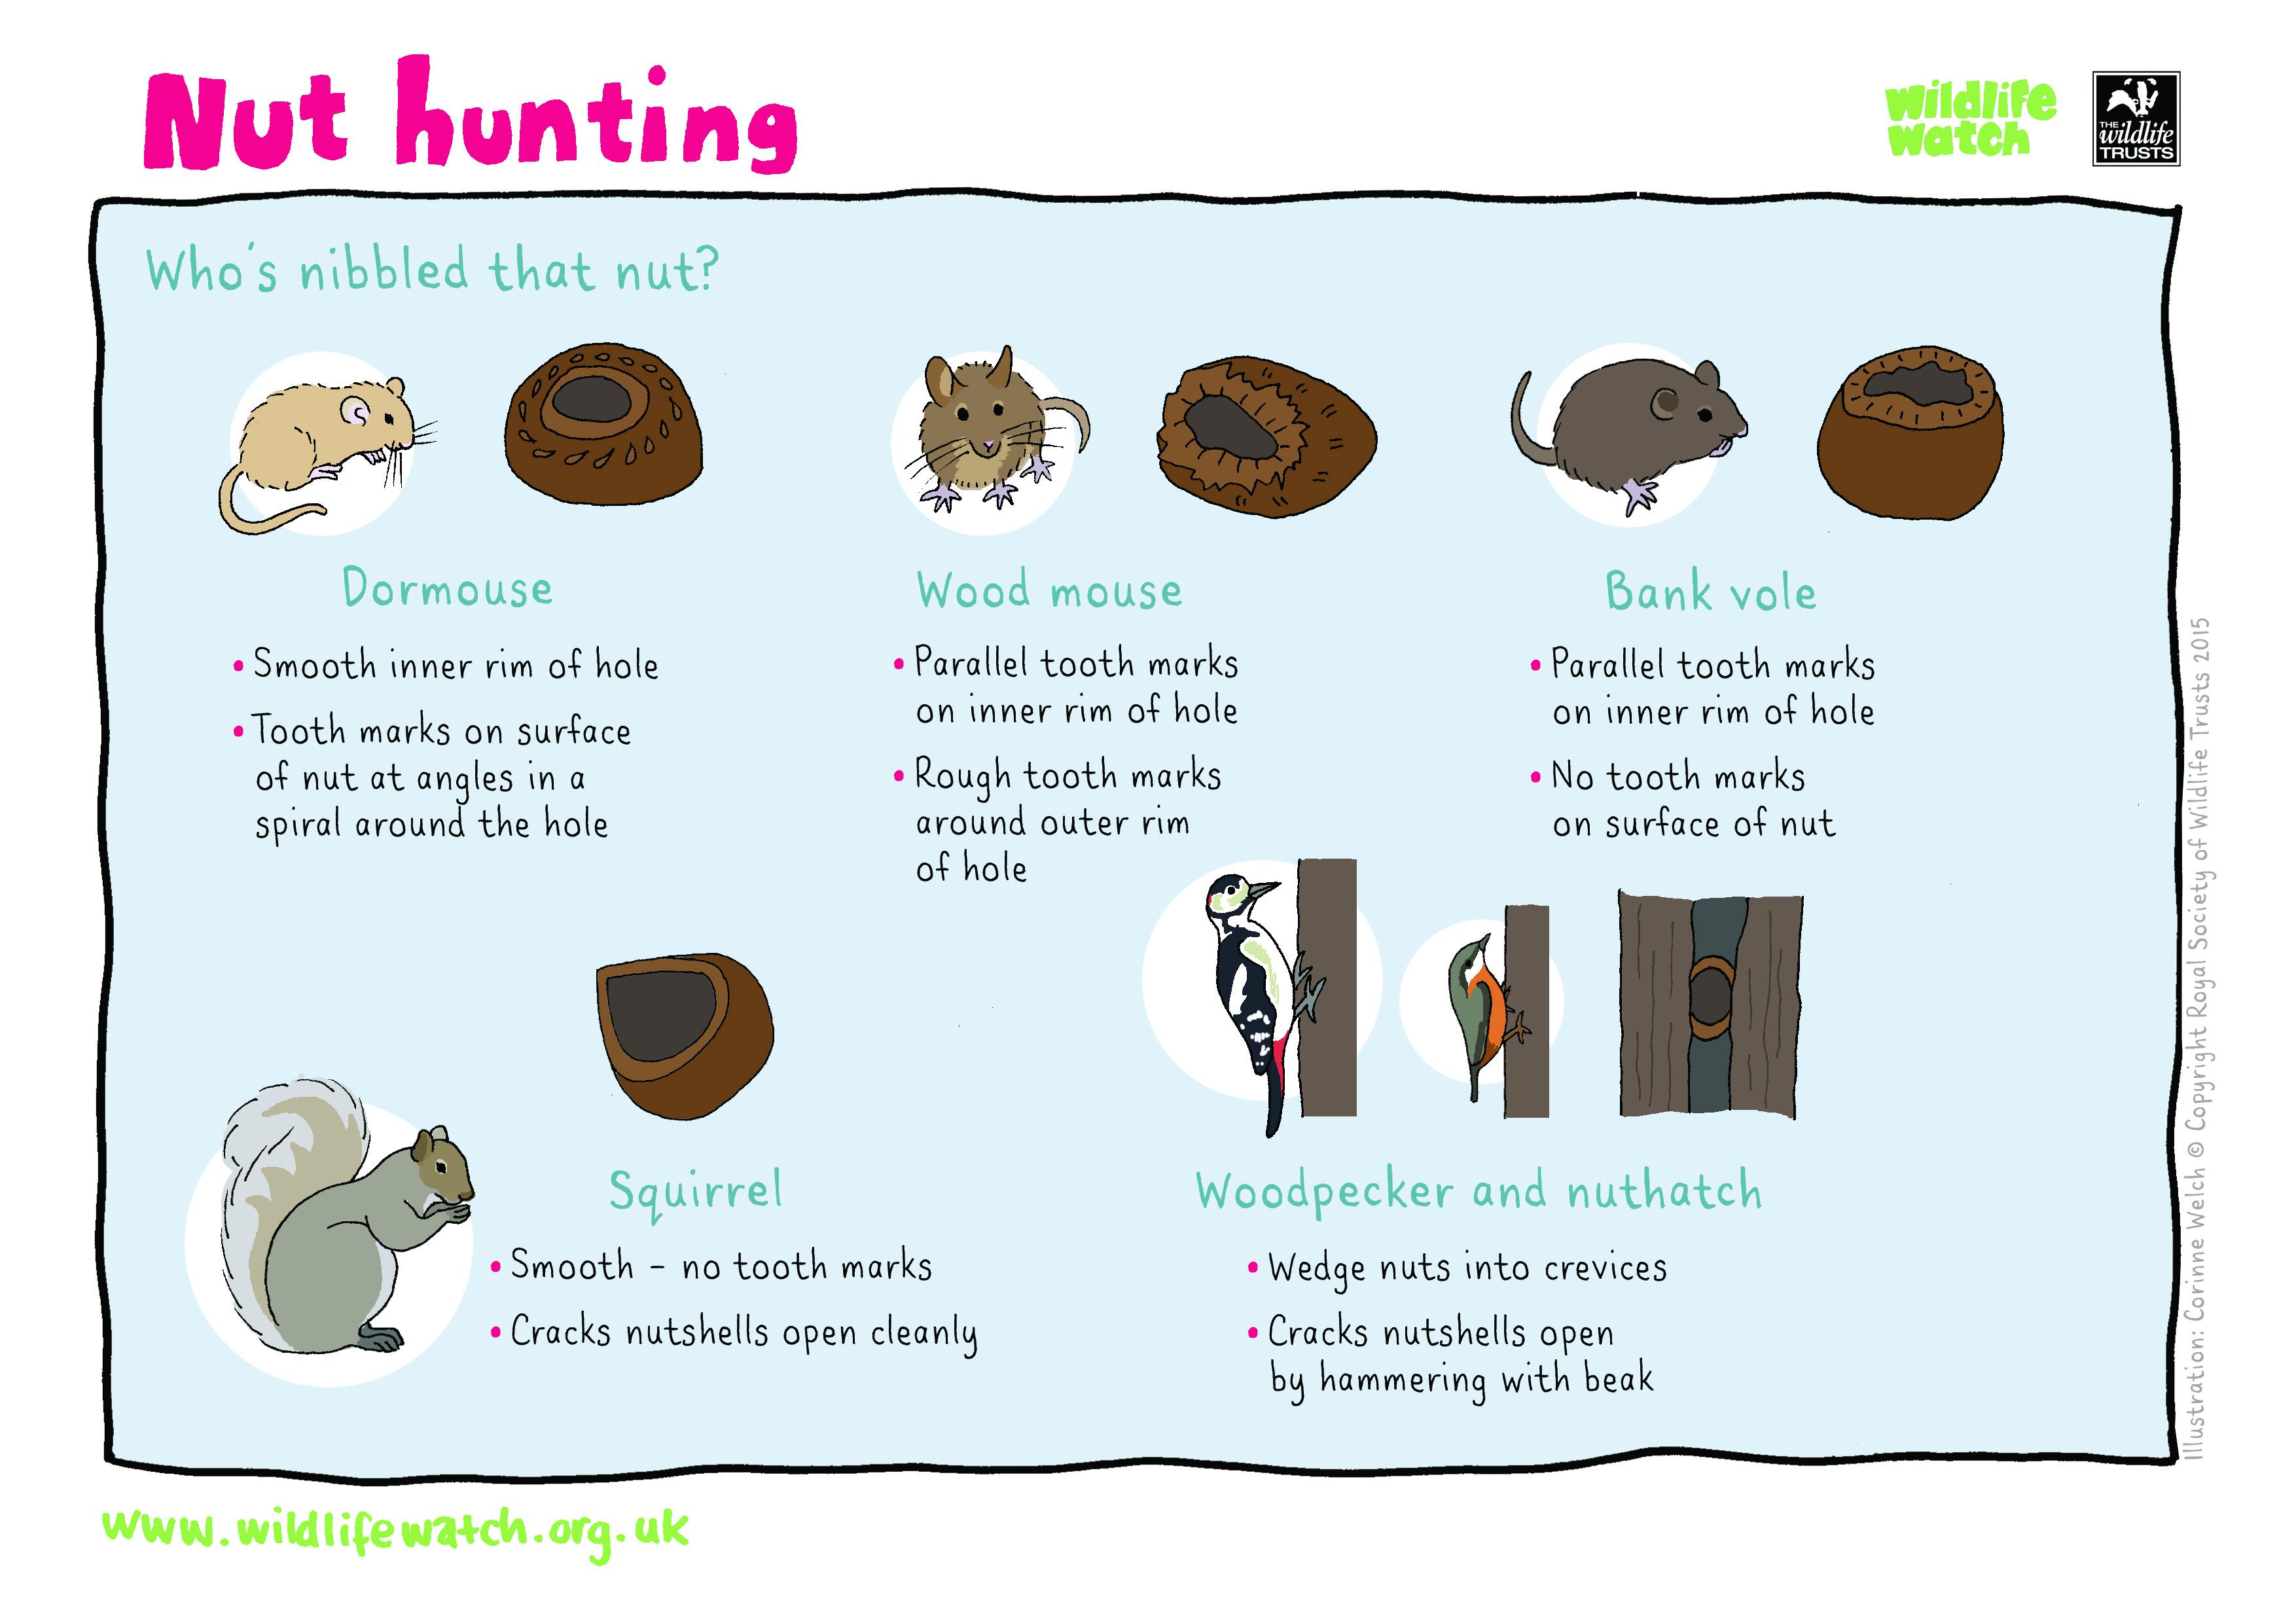 NUT-HUNTING